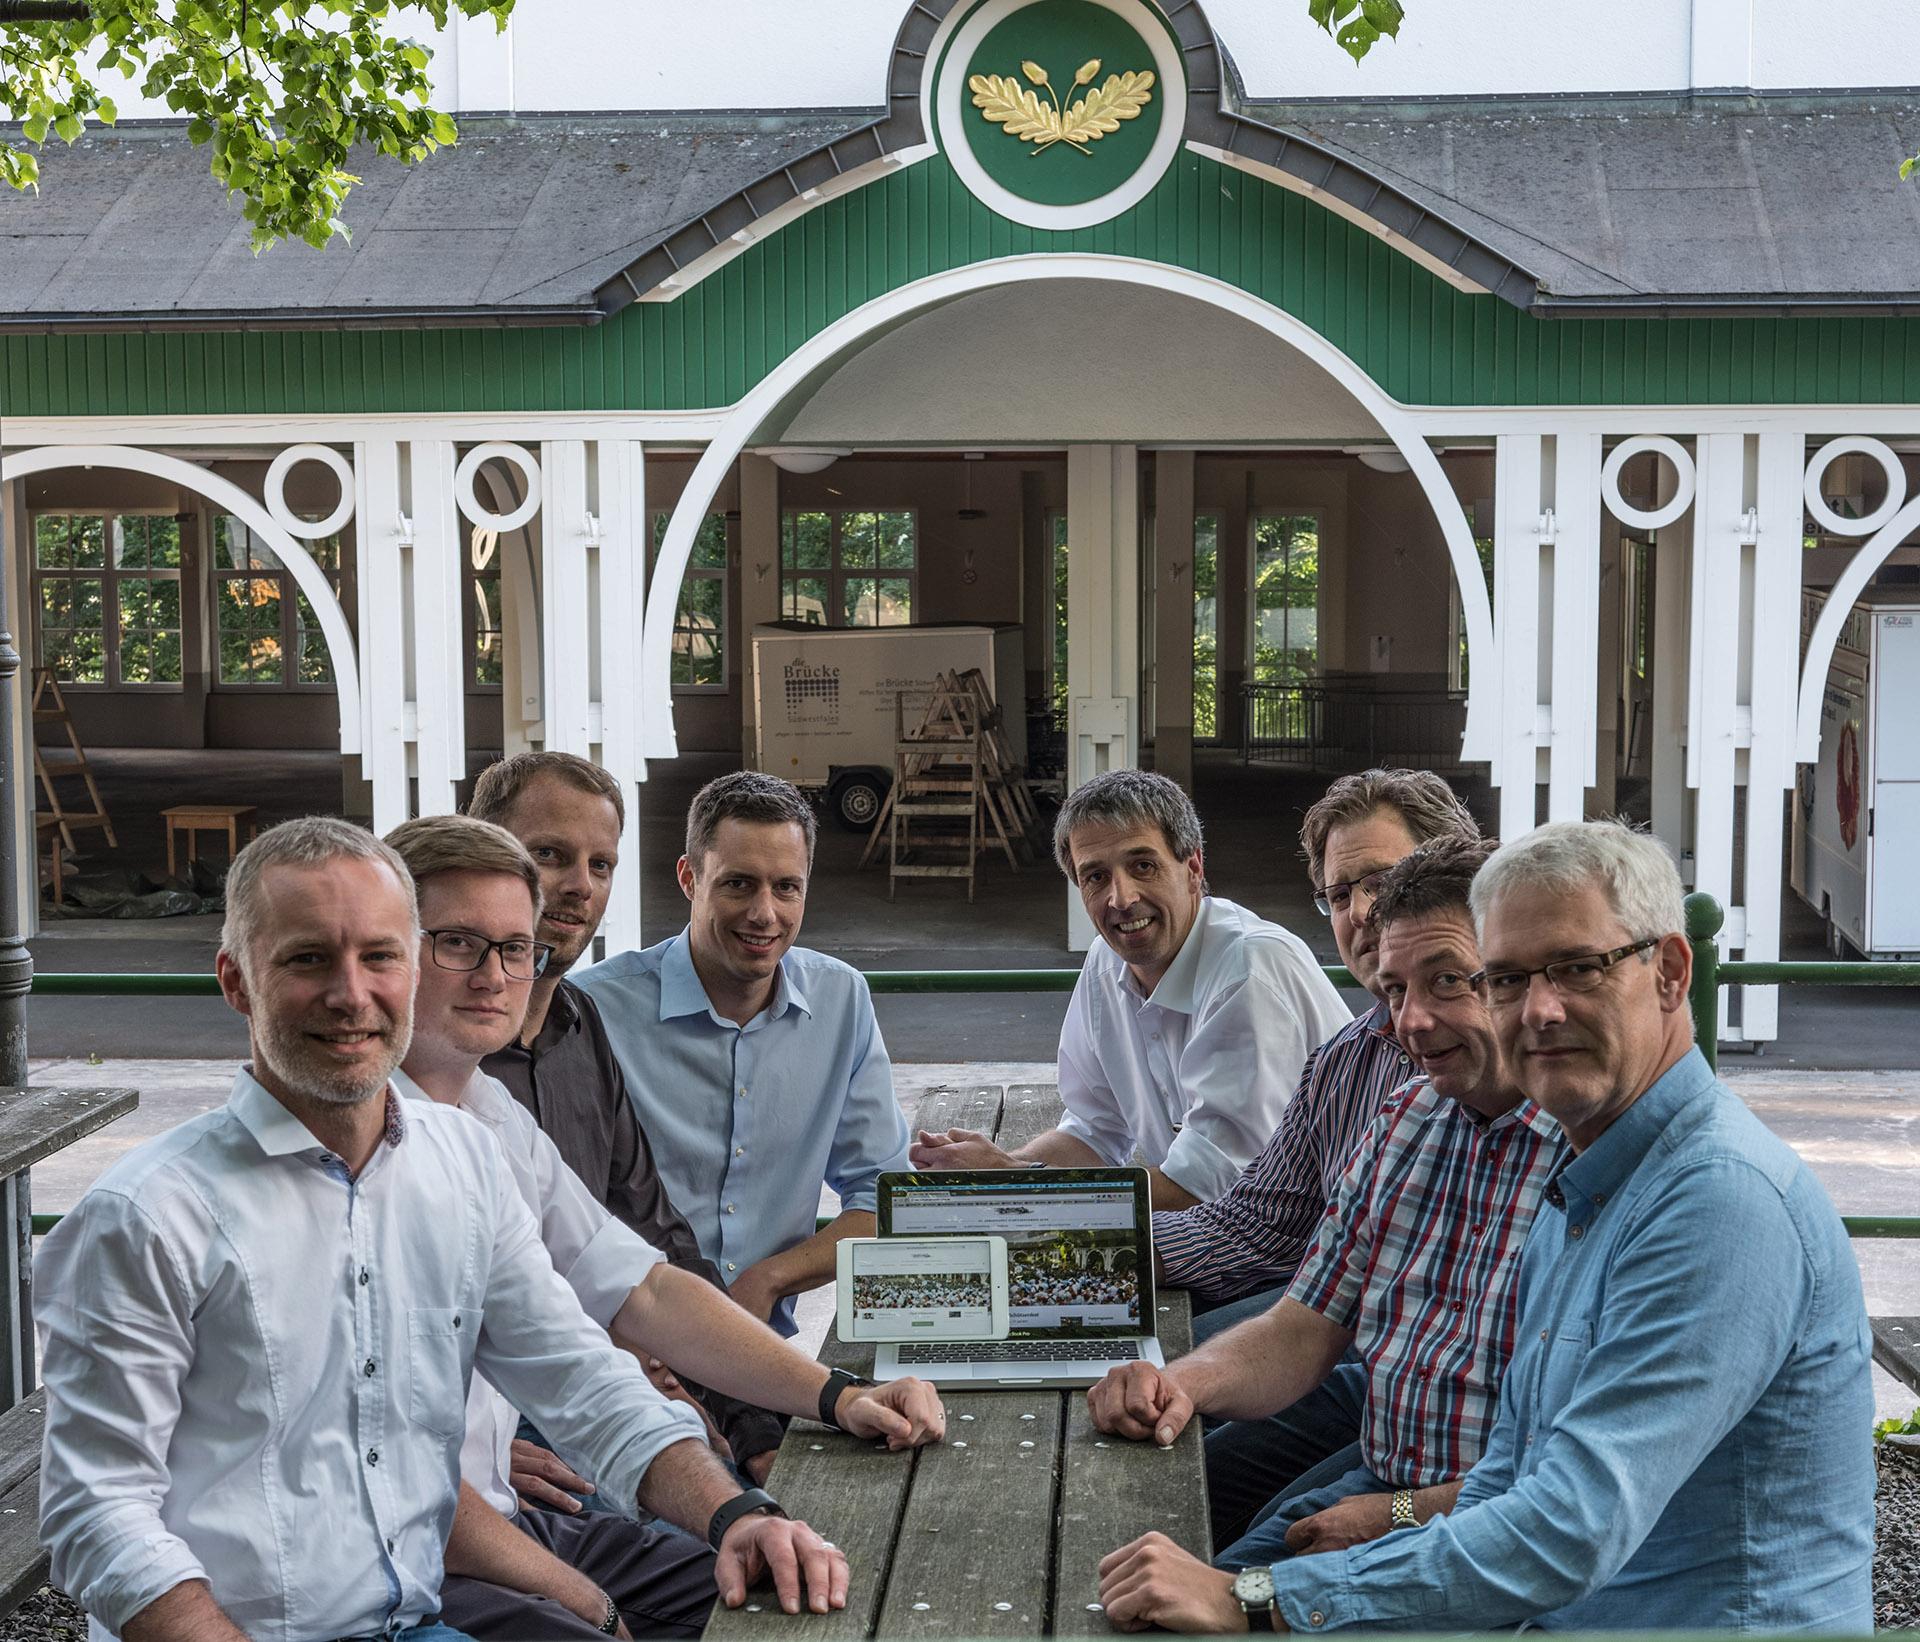 Lt. Simon Niklas, Kai Themanns, Jan-Ole Potinius, Lukas Wrede, Oberleutnant Peter Kliche, Hauptmann Holger Harnischmacher, Major Peter Liese, Markus Arens